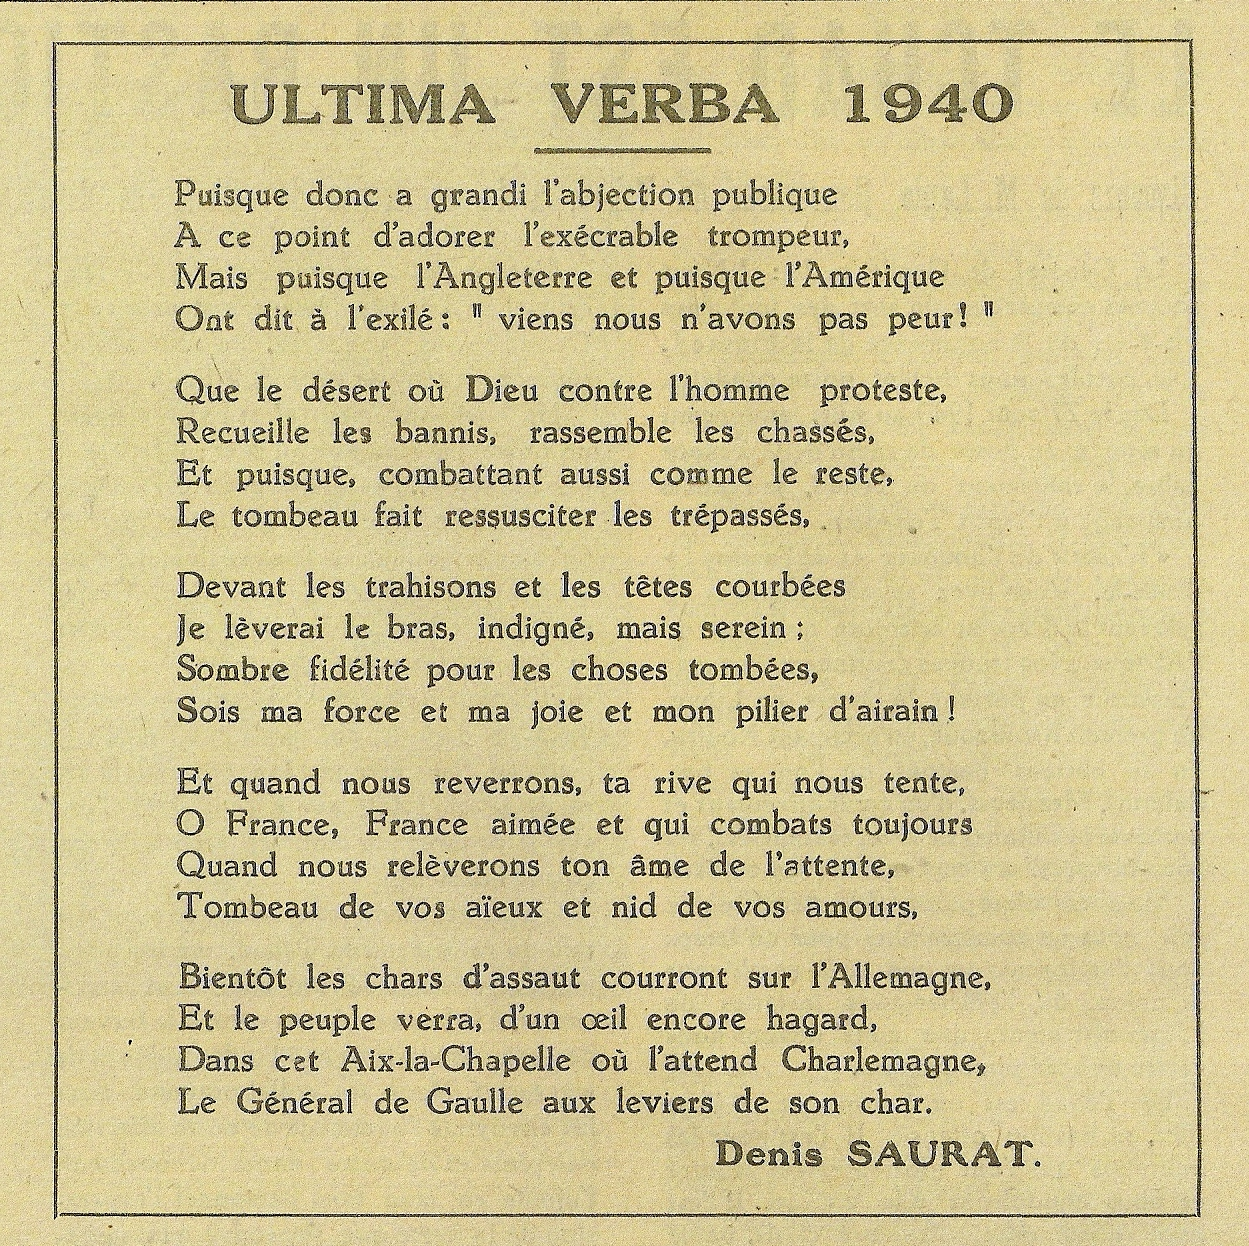 Ultima verba 1940